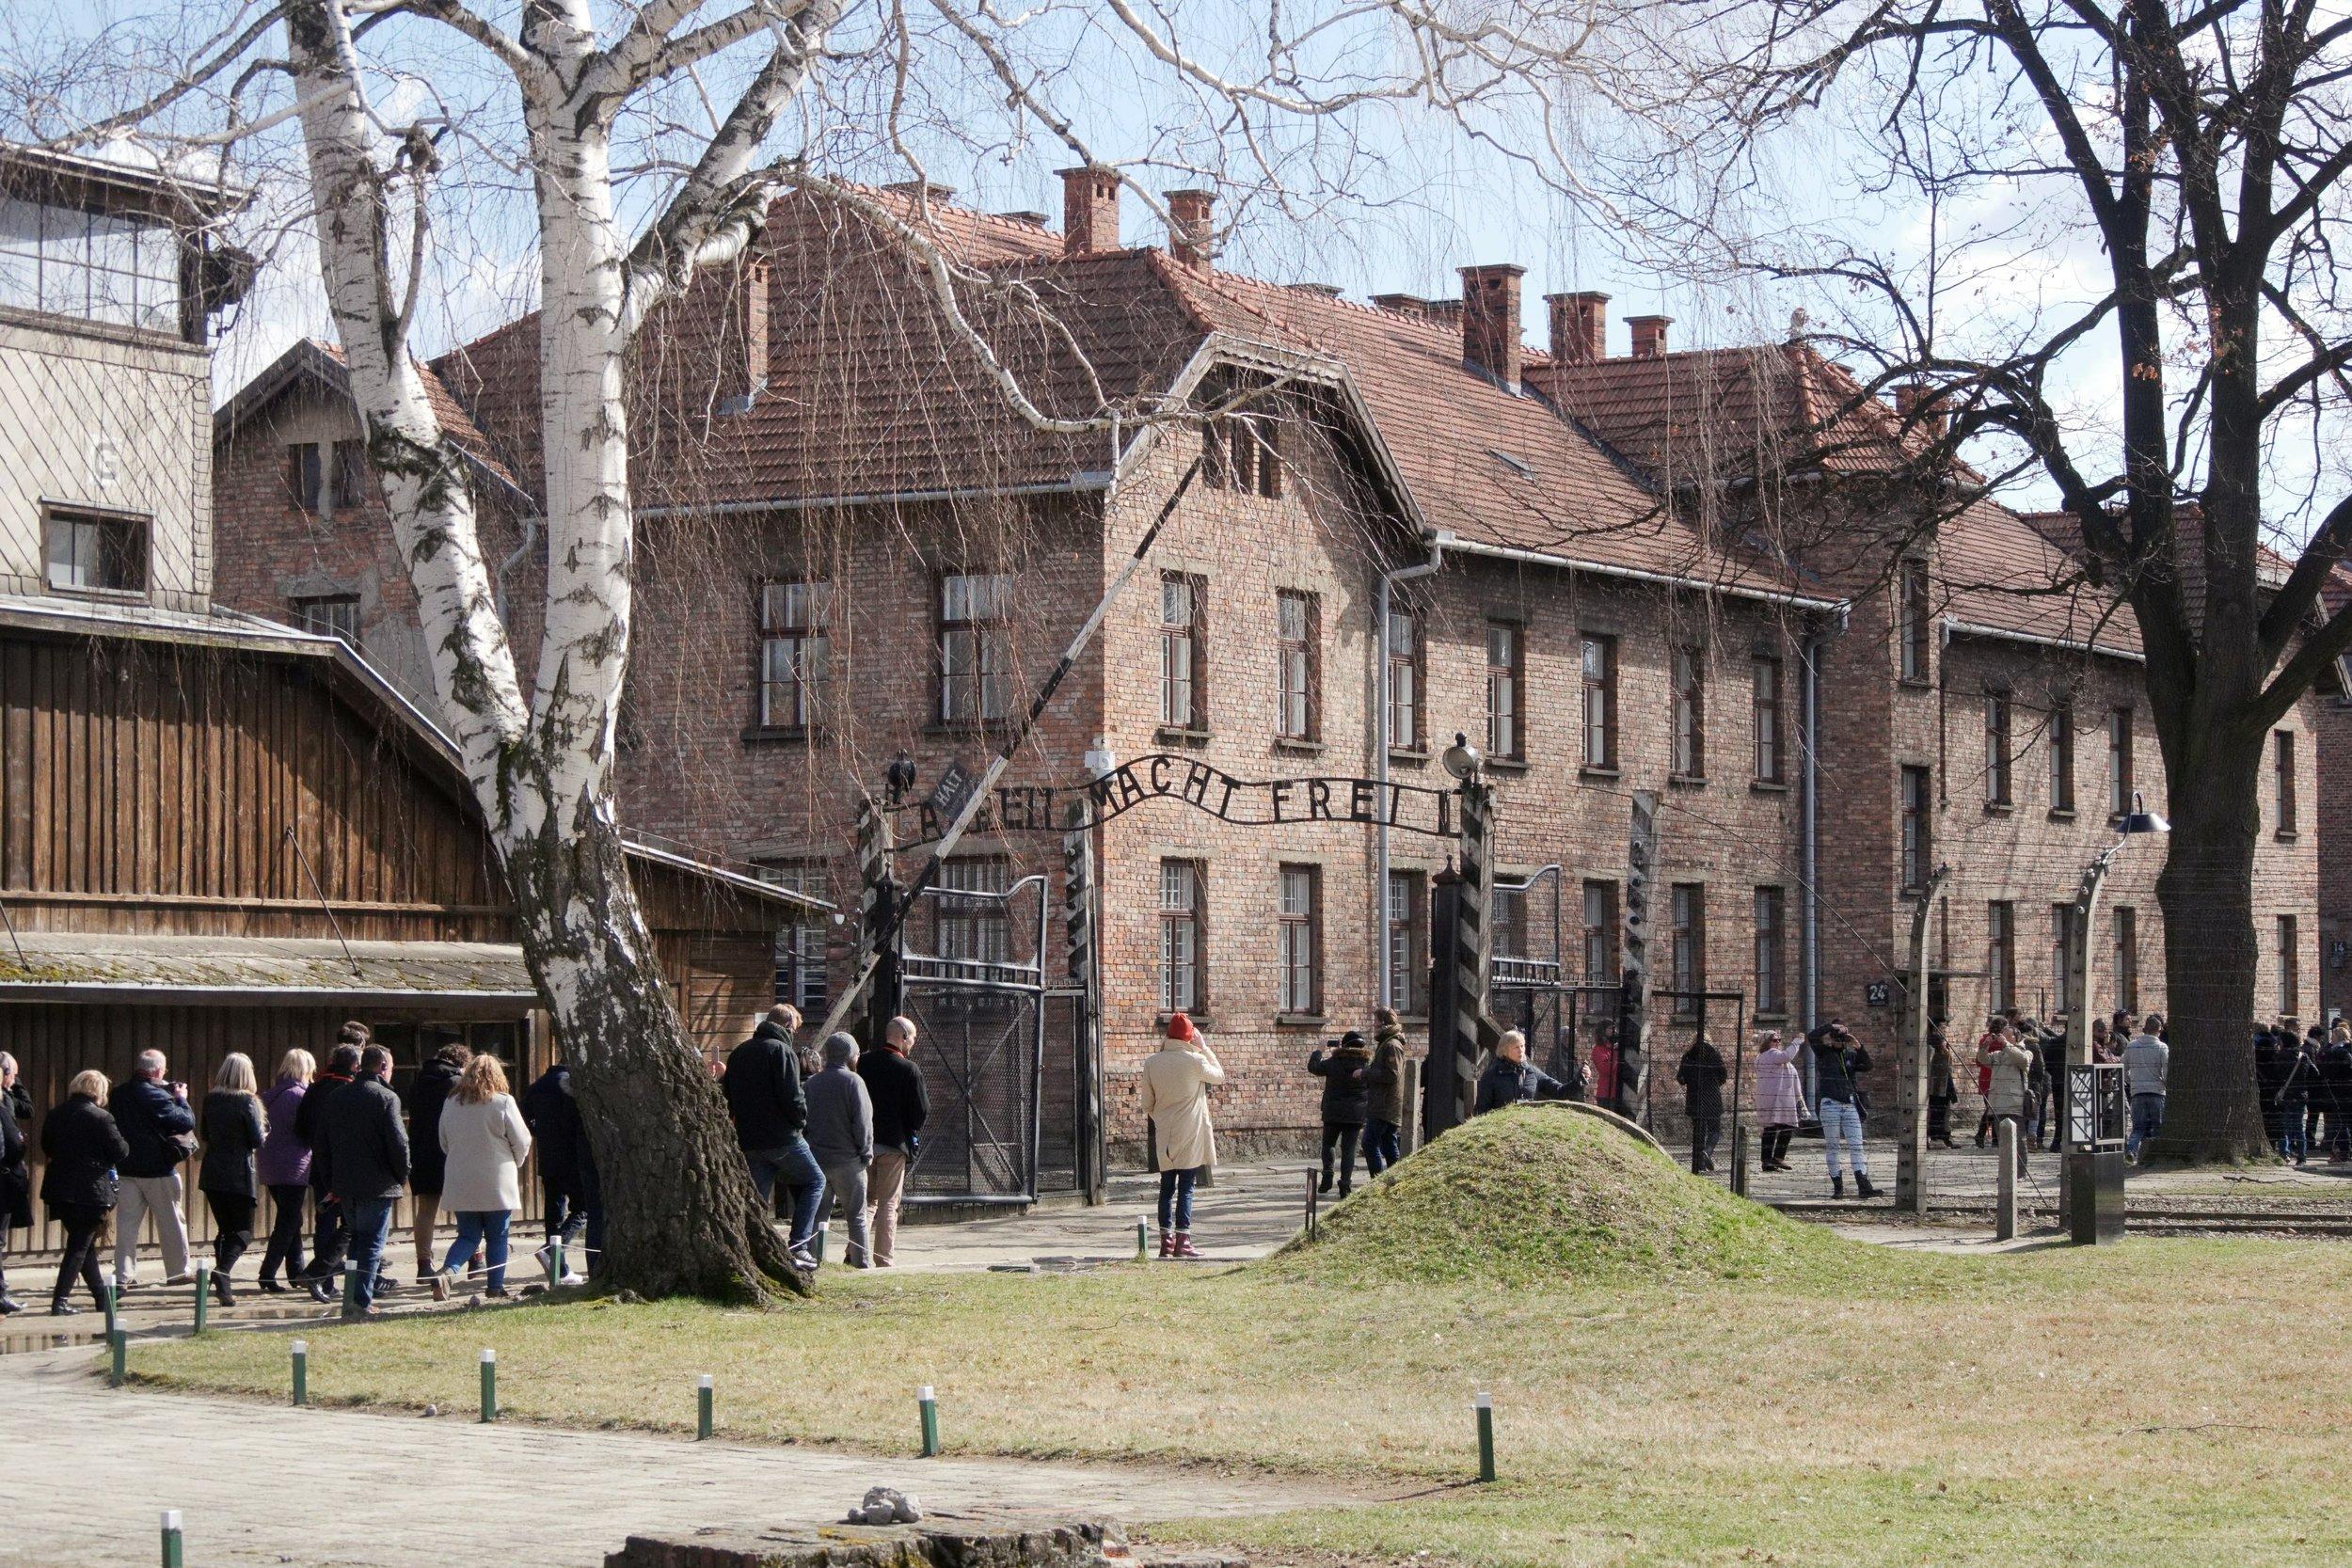 Entrance to Auschwitz I